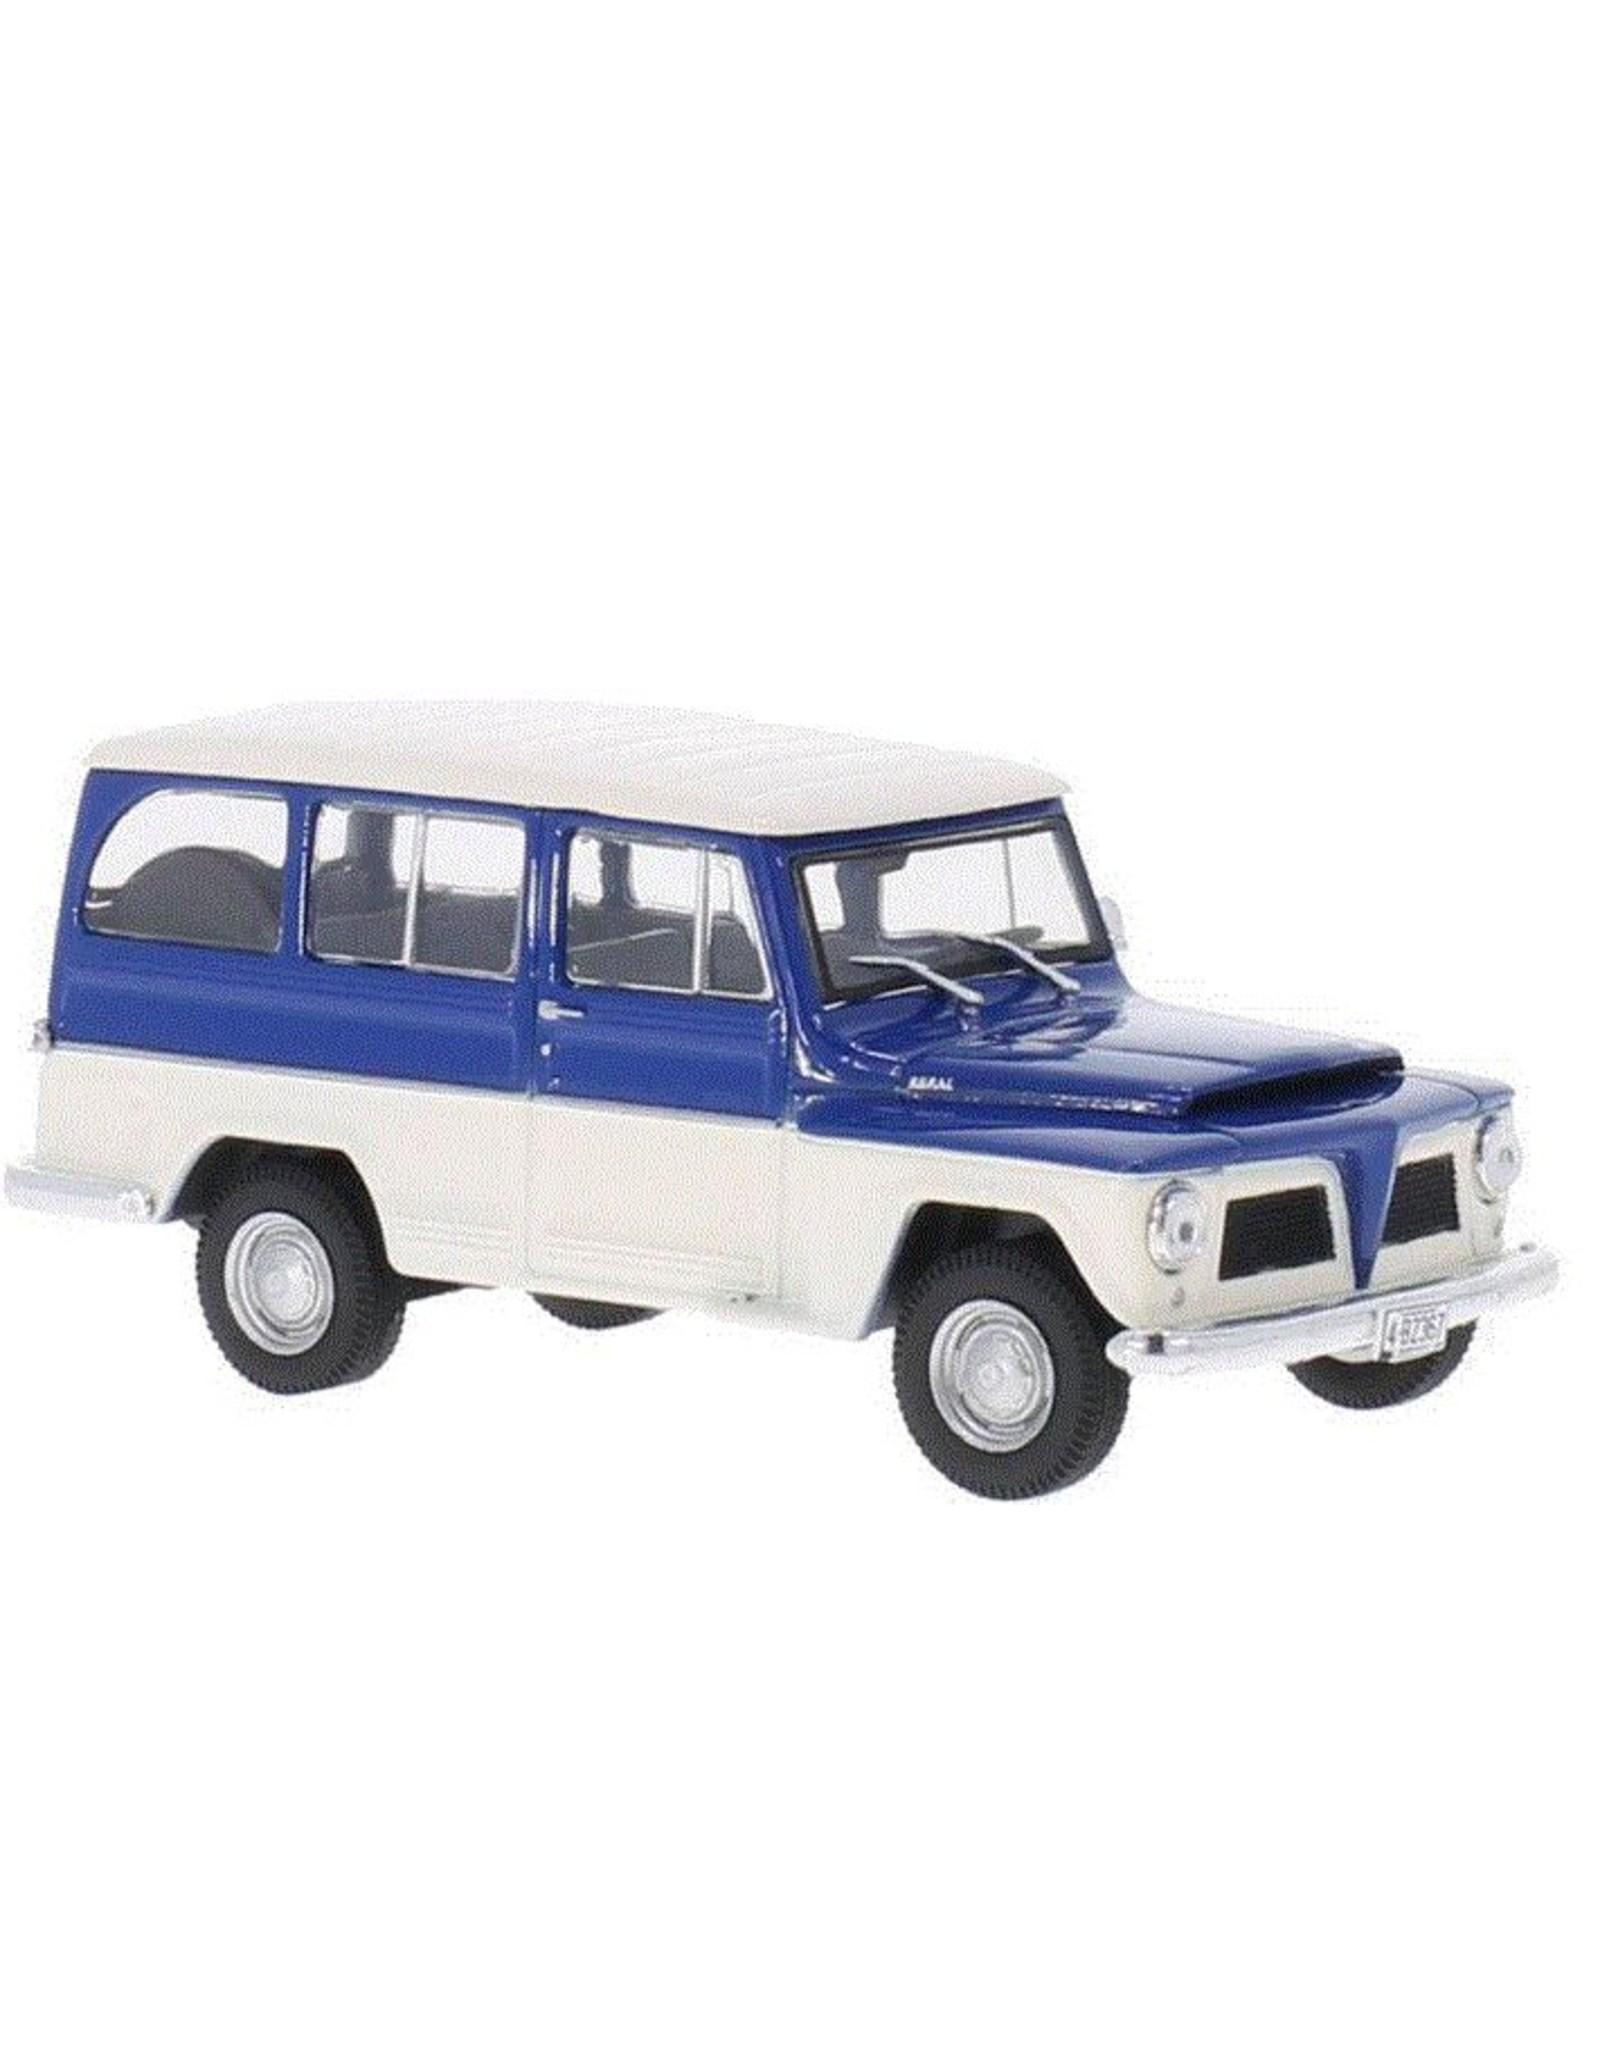 Willys-Overland Willys-Overland Rural 1968 - 1:43 - Whitebox